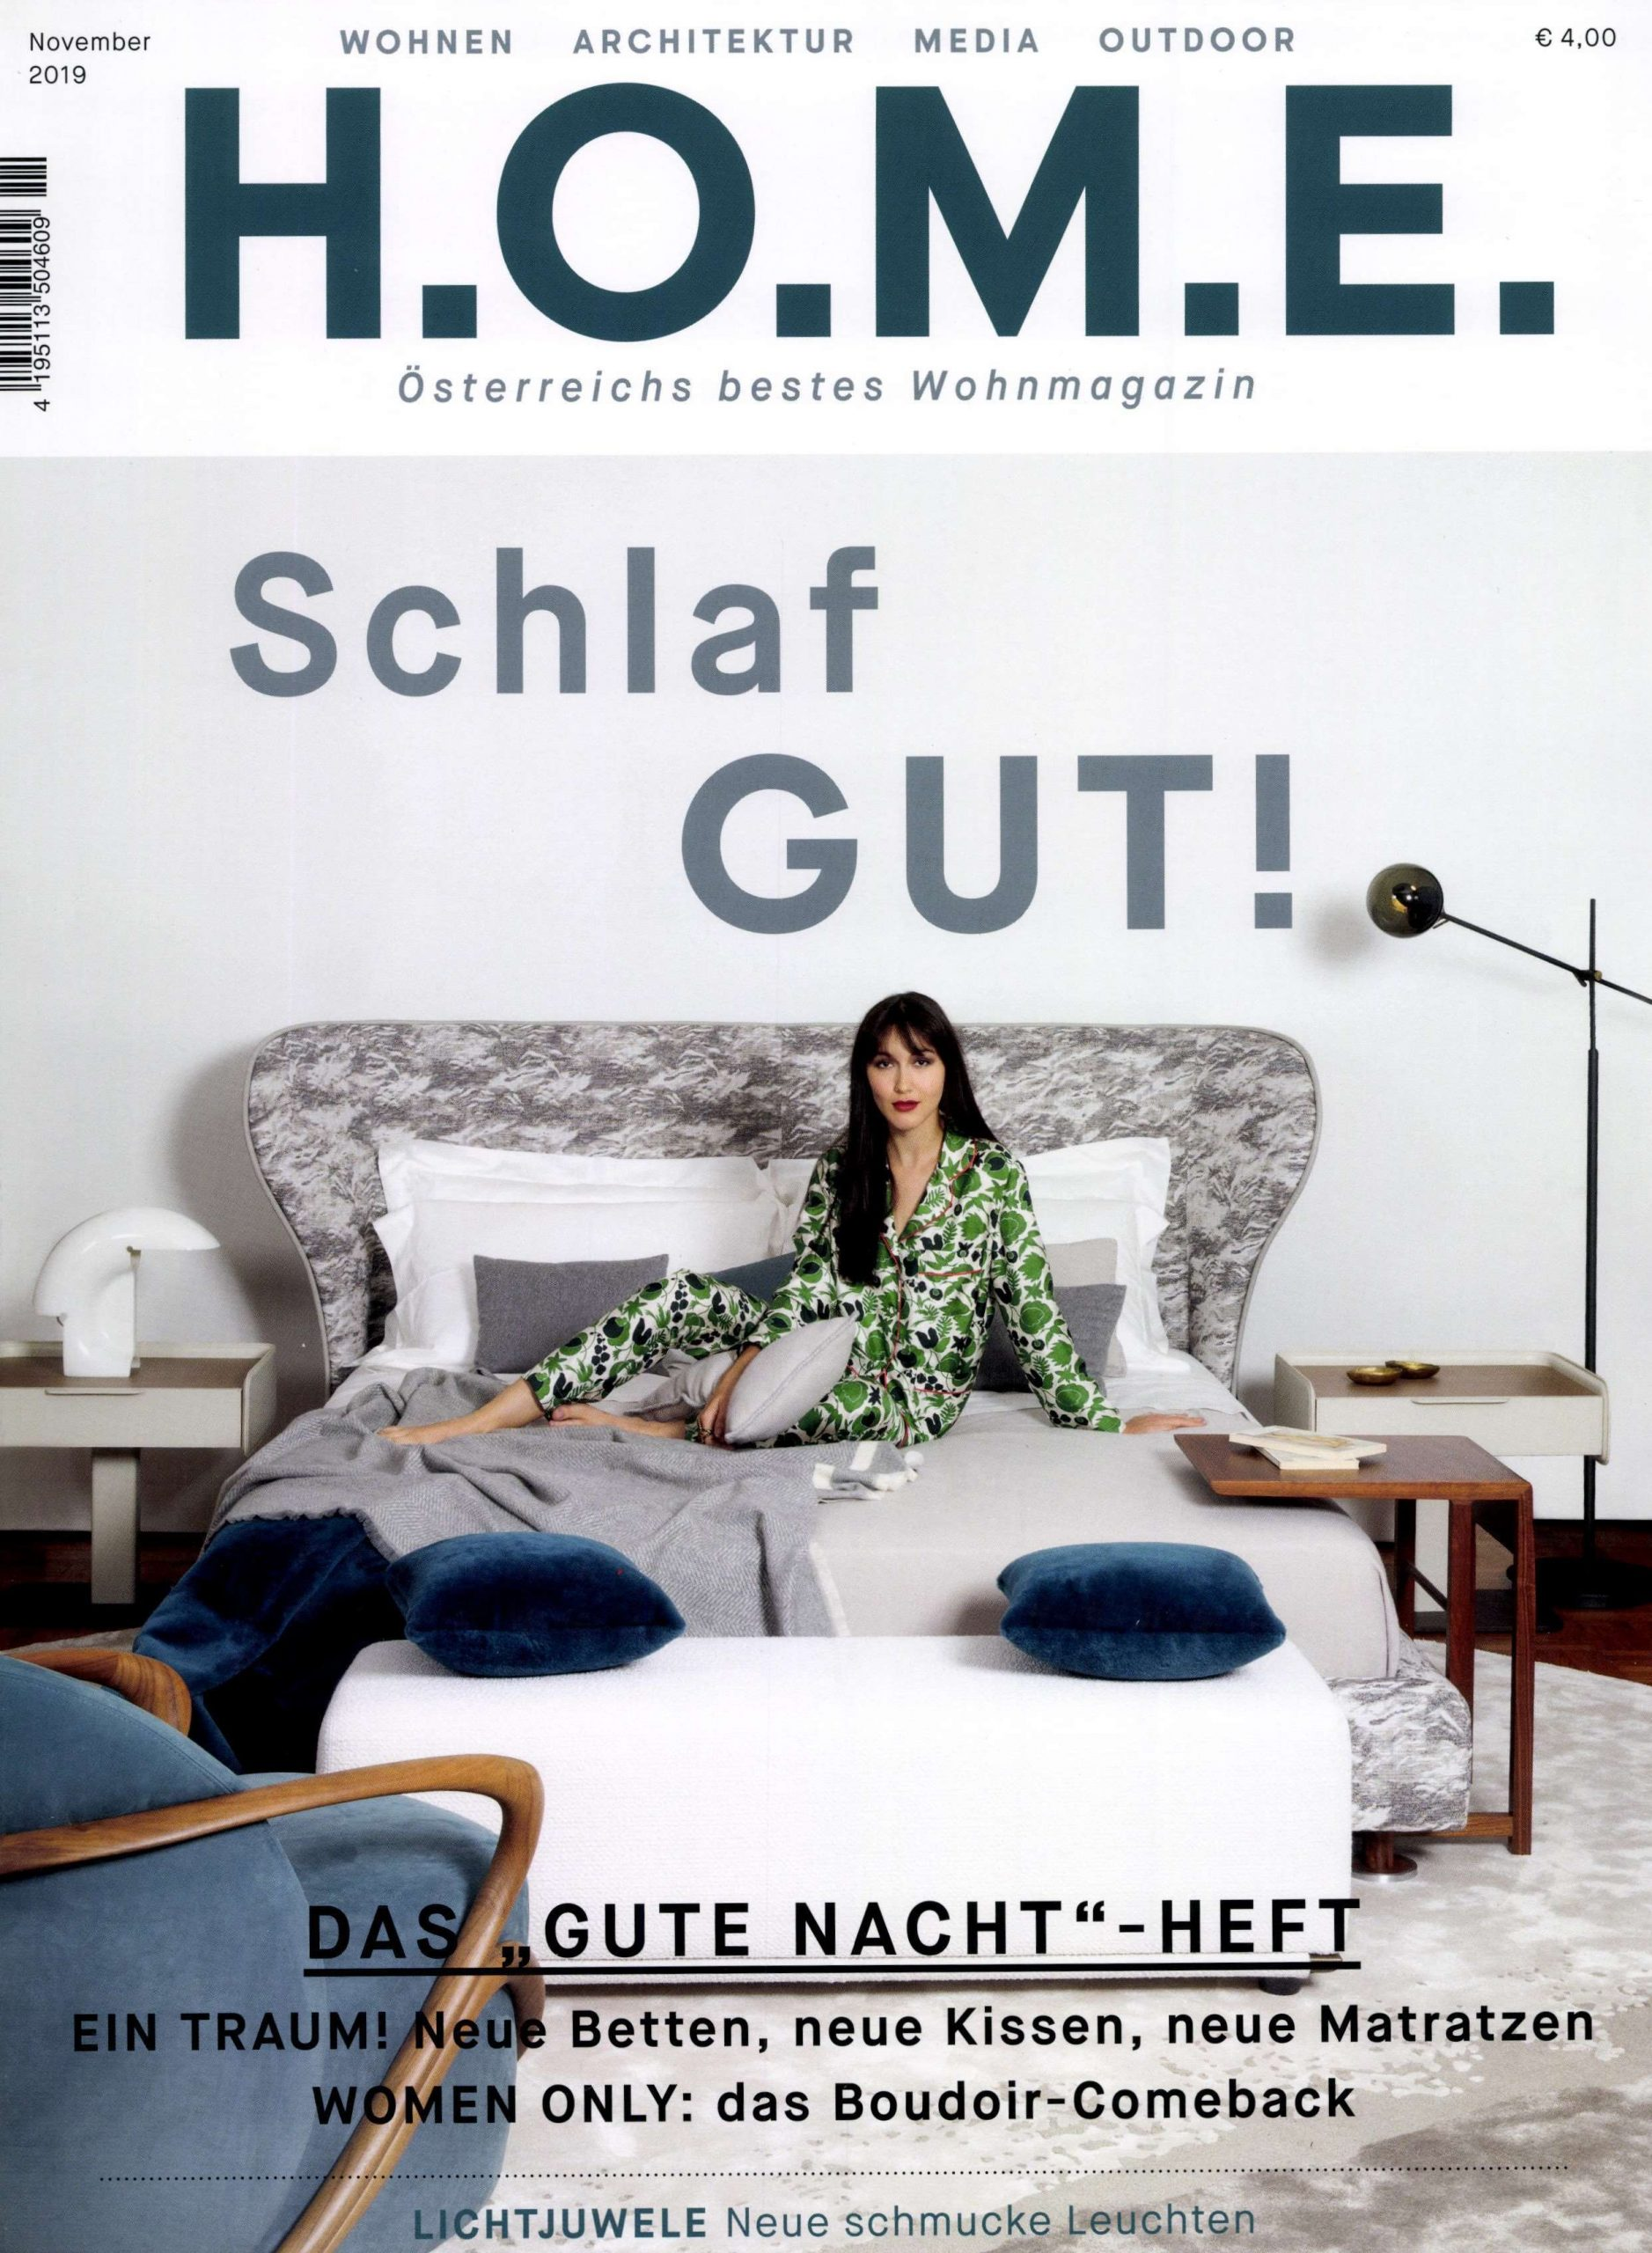 Casa Facile – Gebrüder Thonet Vienna encequiconcerne Revue Jardin Facile